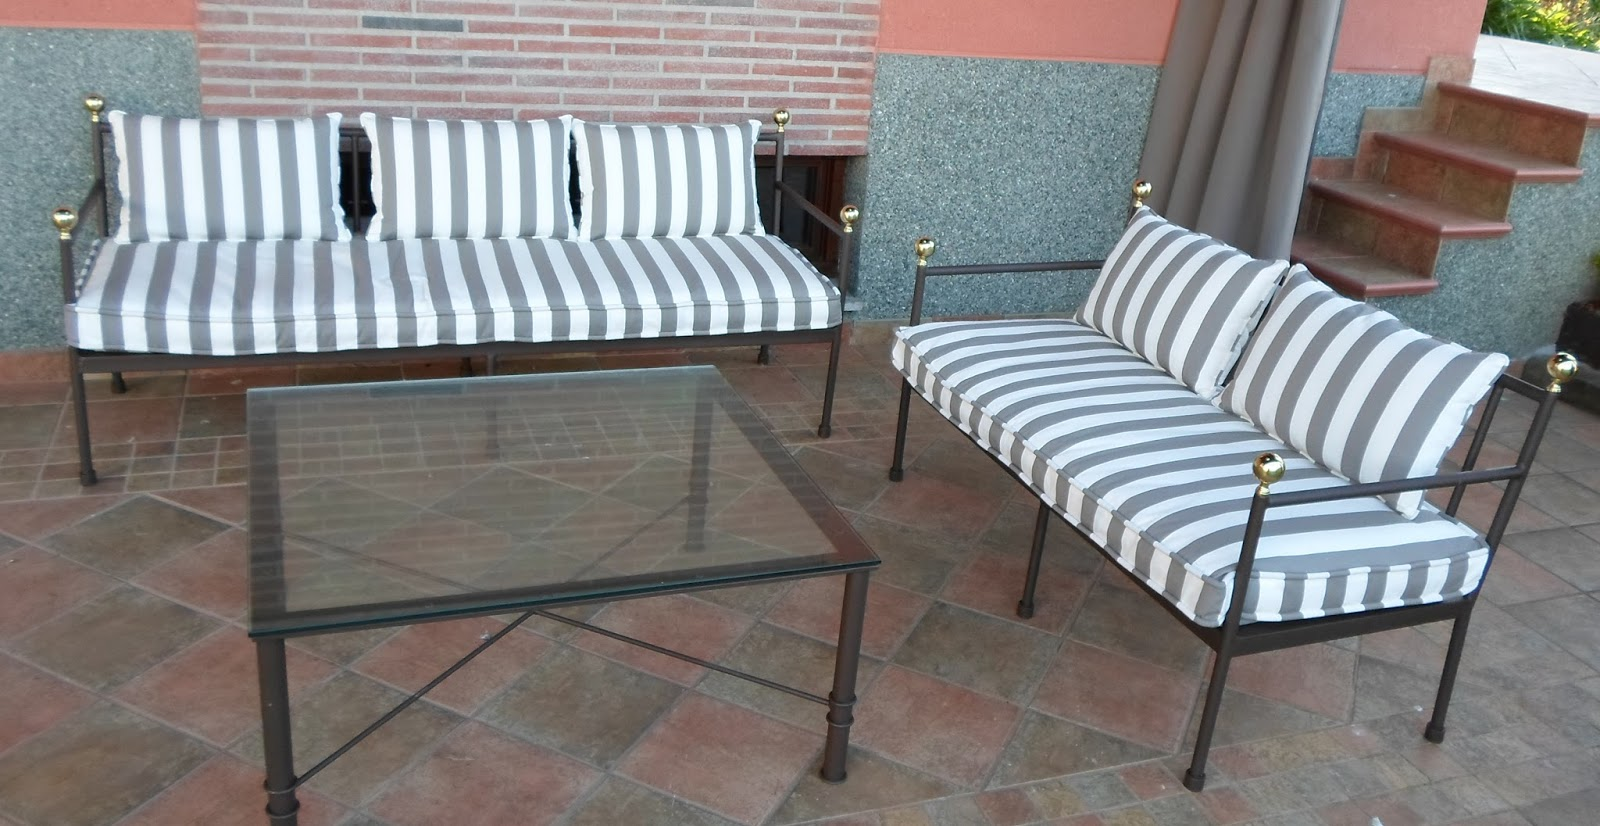 Cojines Para Sillones De Jardin Cheap Affordable Excellent  # Cojines Muebles Terraza